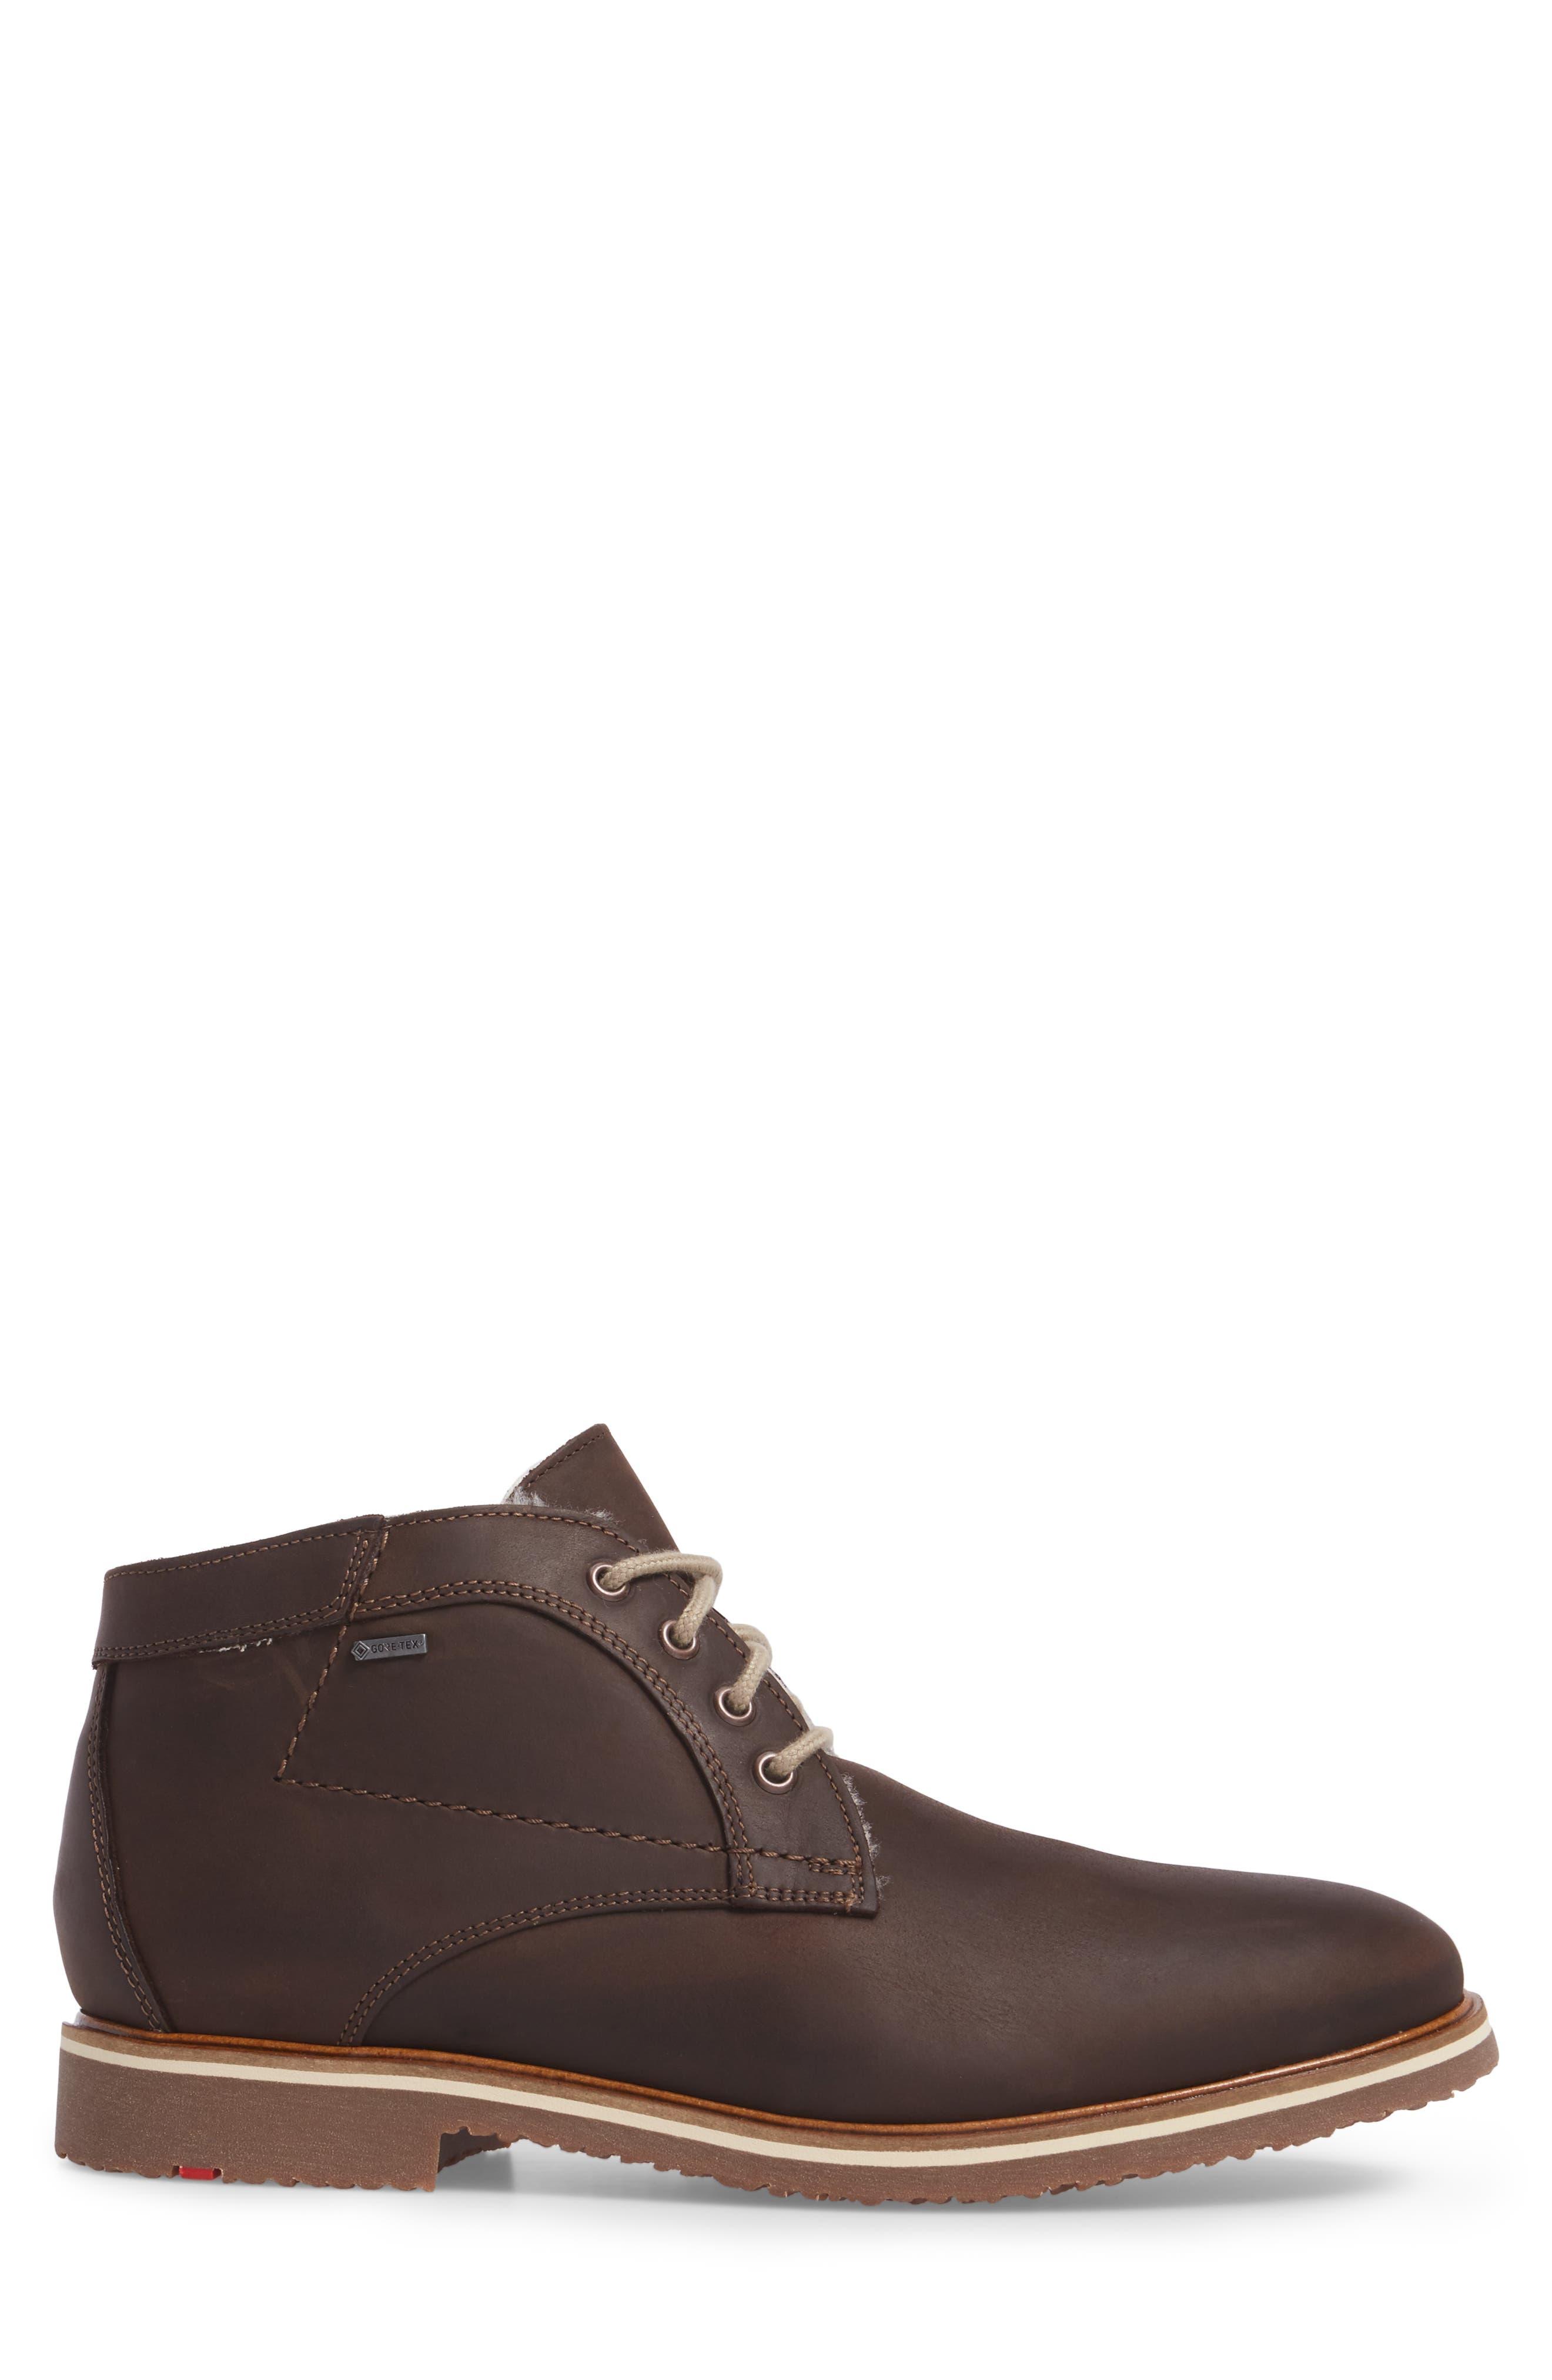 Varus Waterproof Shearlng Lined Chukka Boot,                             Alternate thumbnail 3, color,                             Ebony Leather